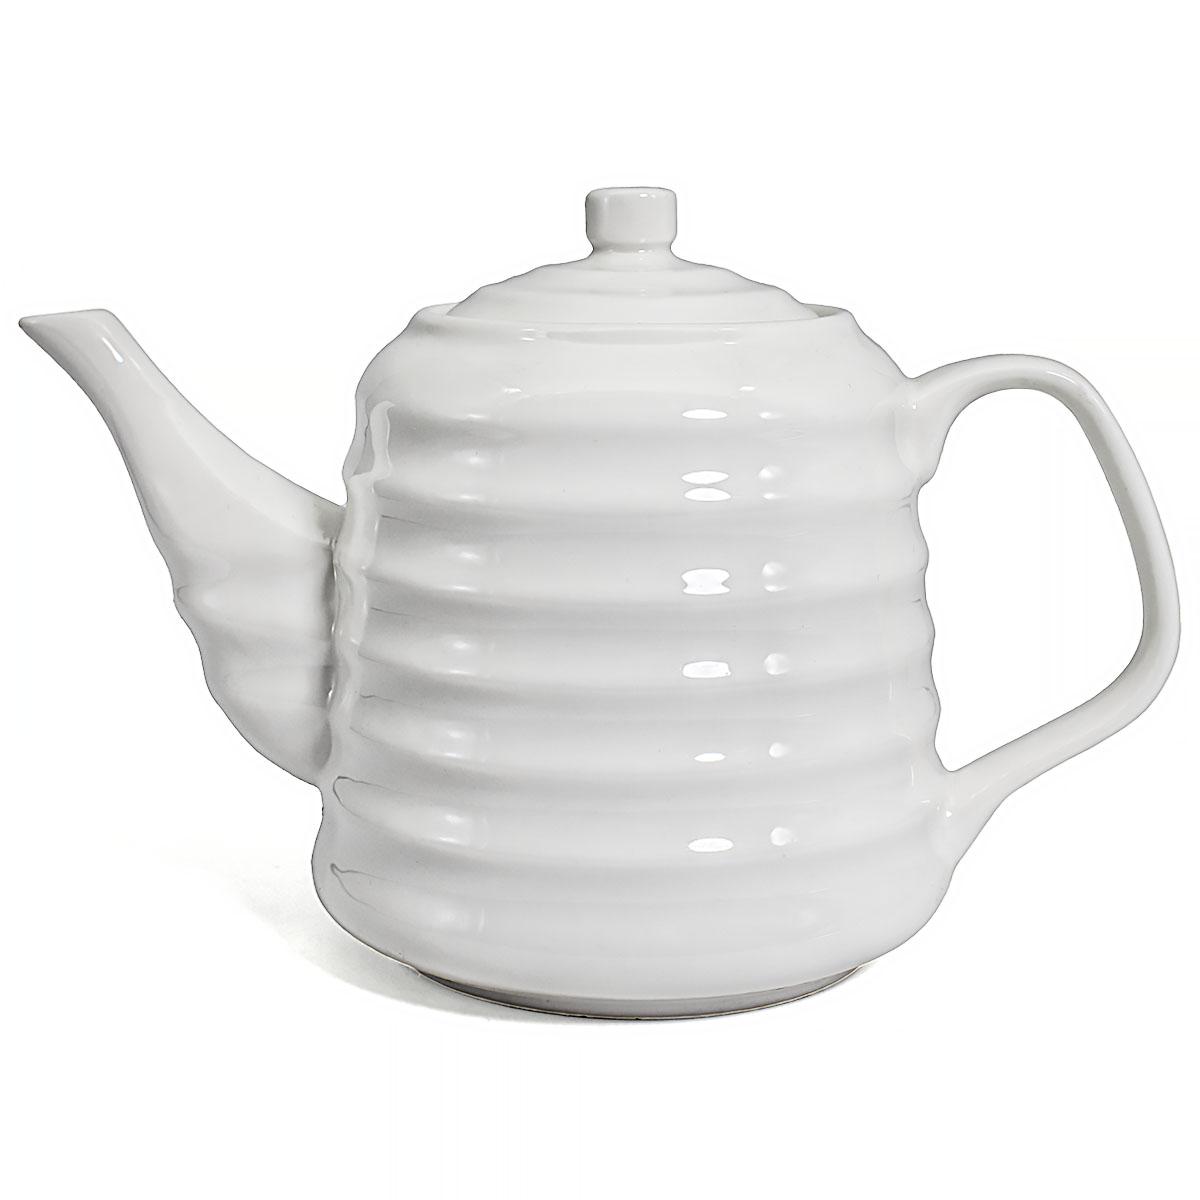 Заварочный чайник Милый, фарфор, 850 мл